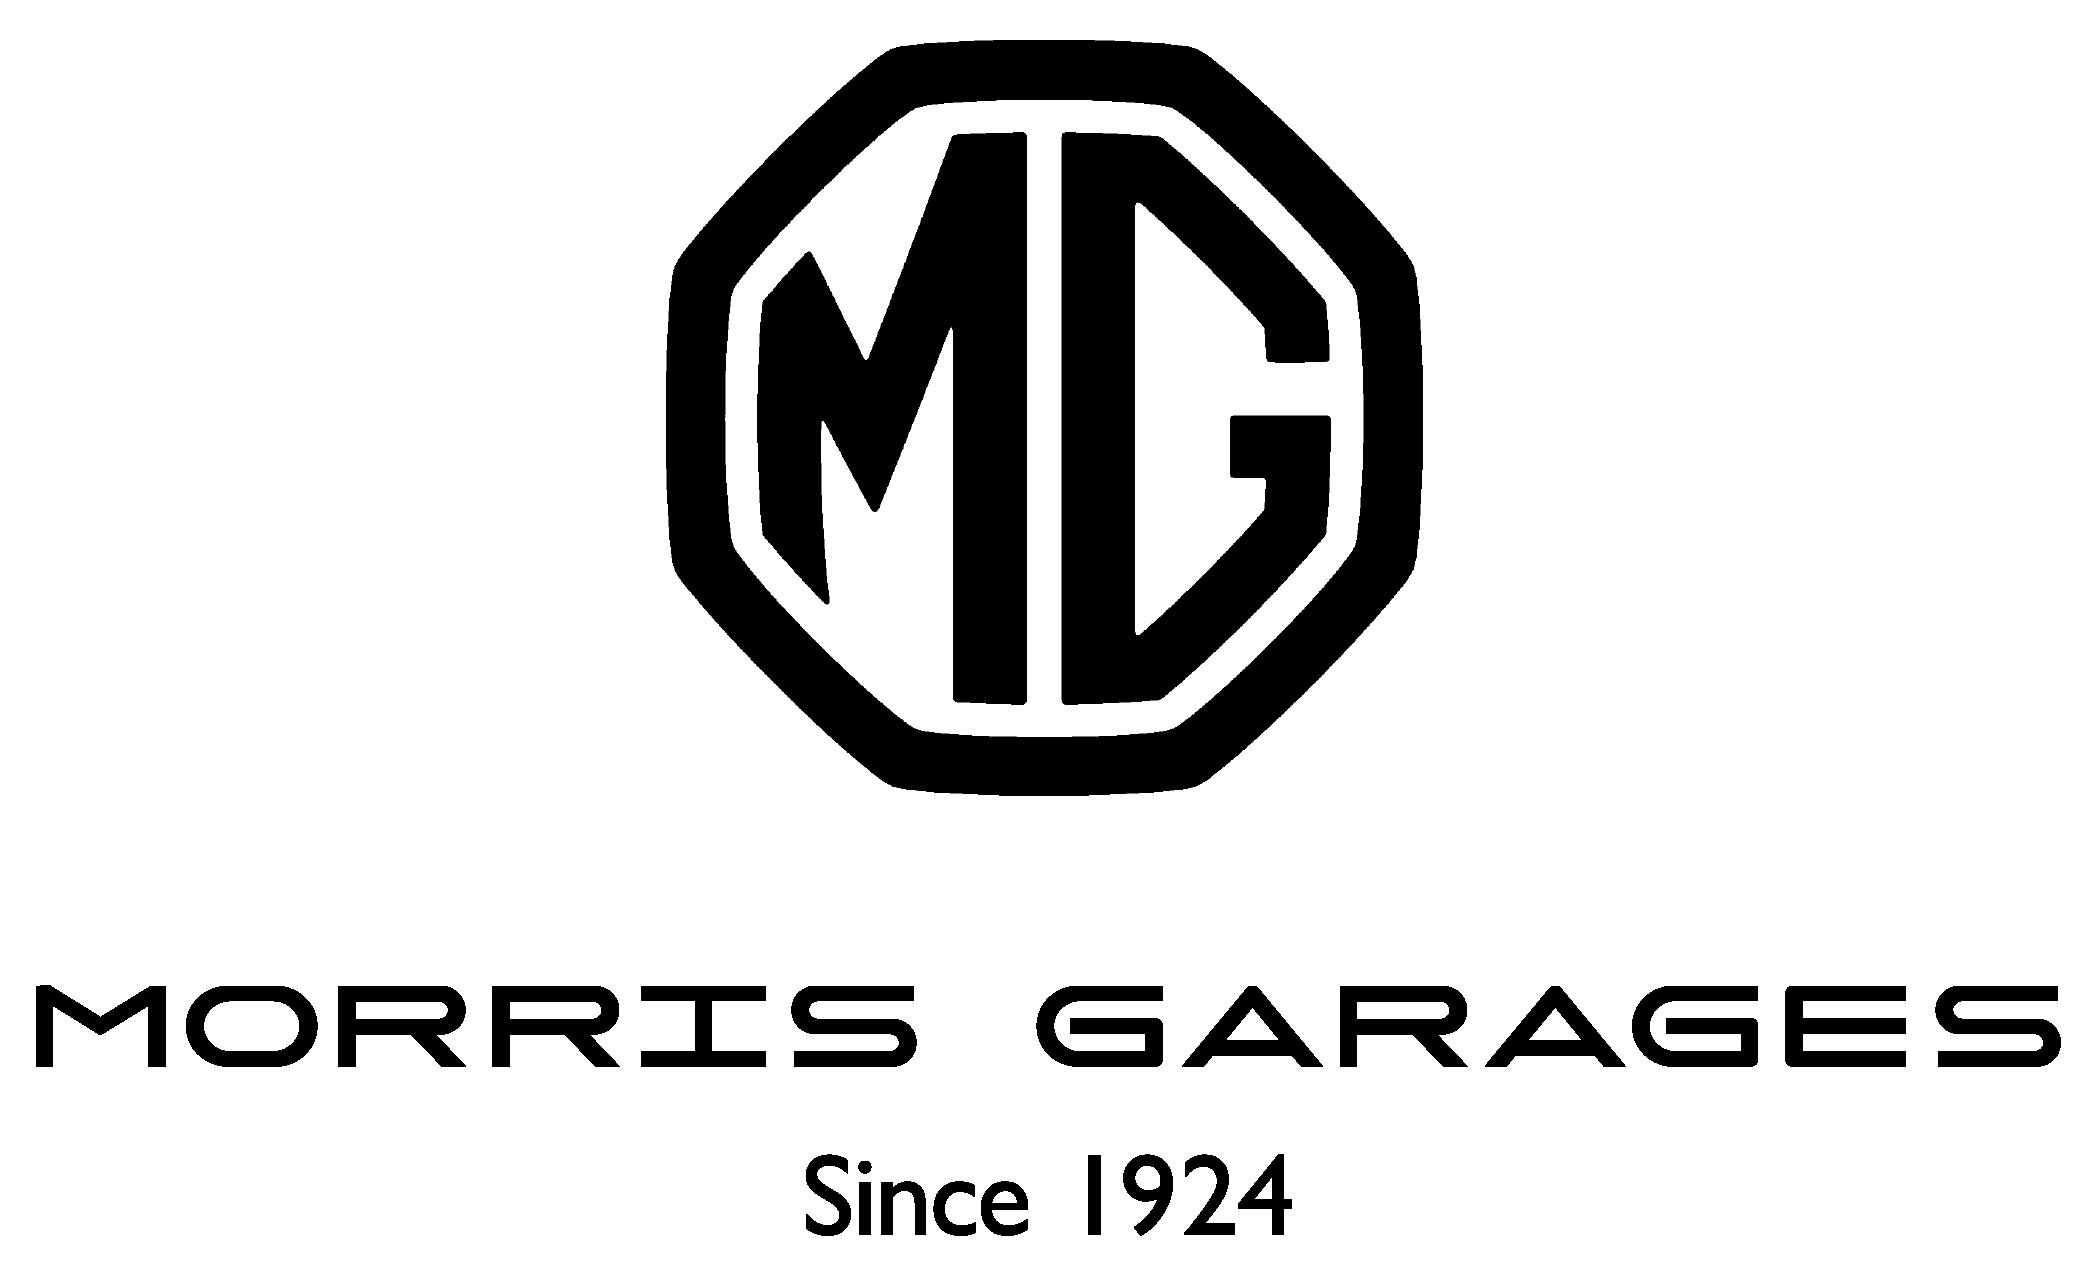 https://assets.roar.media/assets/MIQ19hio9Sb9J6dt_MG_Logo-02.png